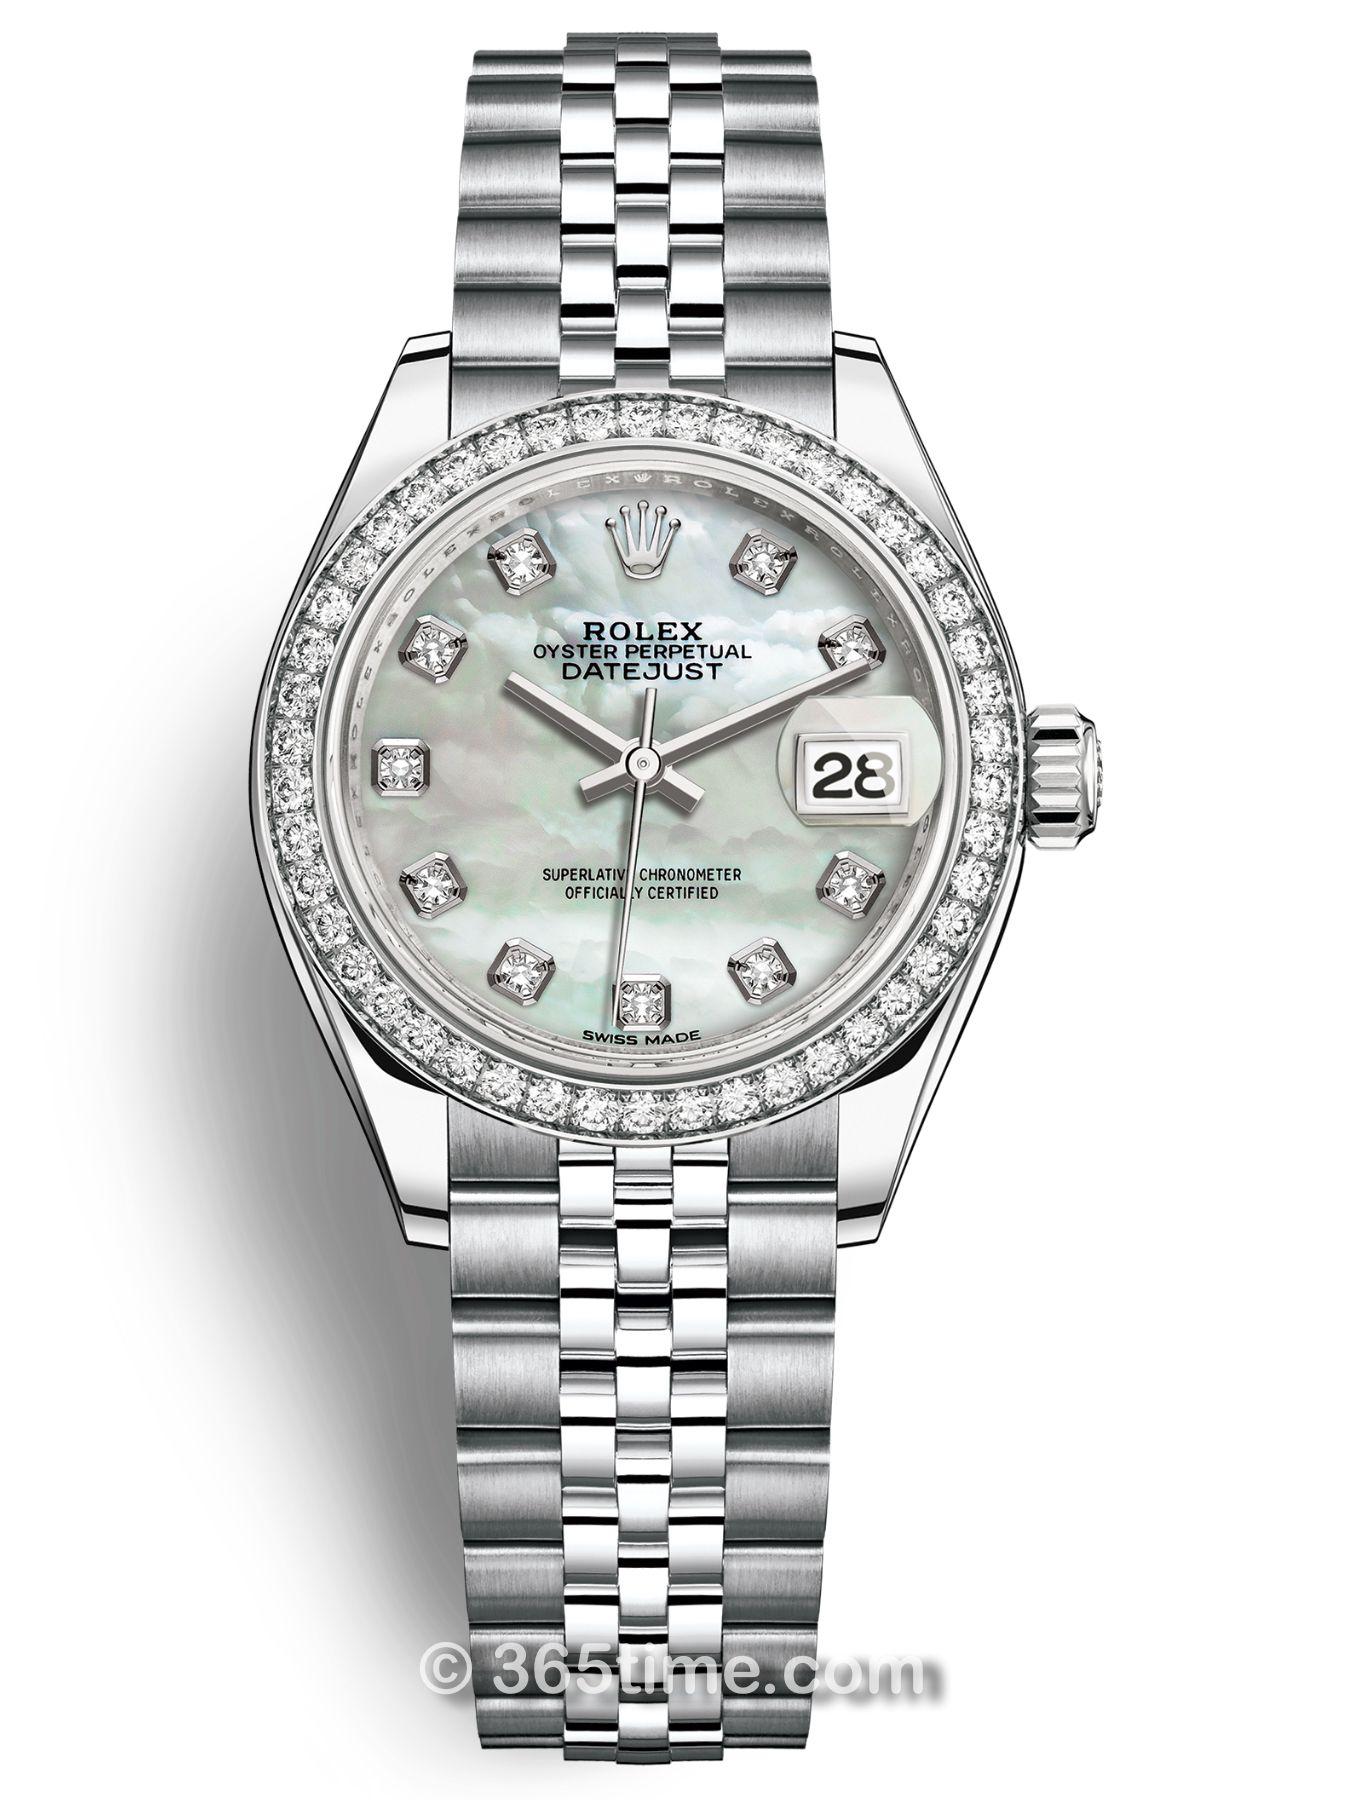 Rolex劳力士女装日志型28白金镶钻手表279384rbr-0011